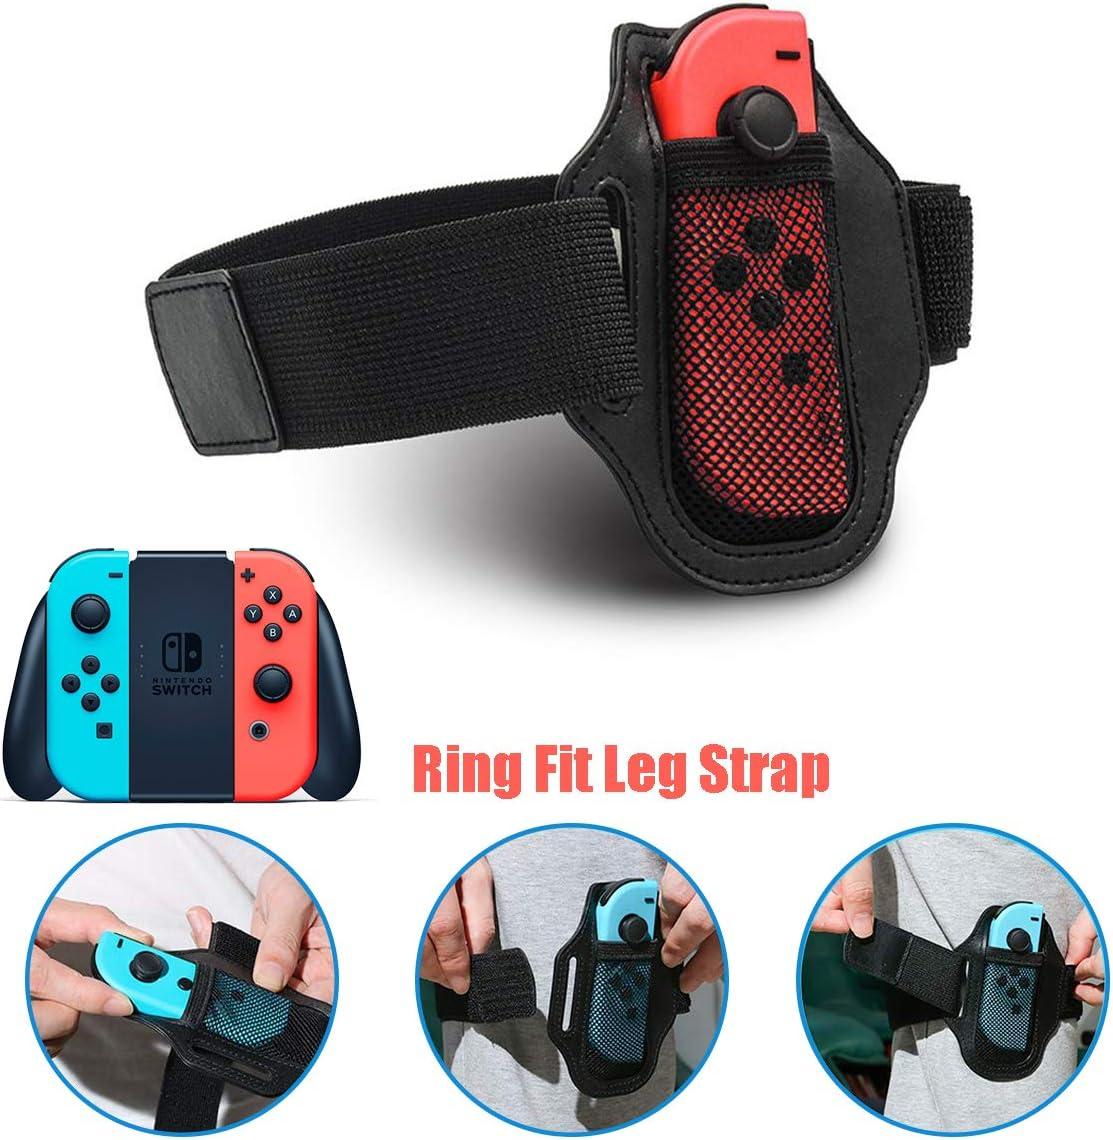 SIQDAK NS-Switch Game Fitness Ring, Adventure NS Ring Fit Somatosensorial Sports Game Yoga Fitness Ring + Straps, Adecuado para Grandes Deportes de Aventura Somatosensorial Juegos: Amazon.es: Electrónica